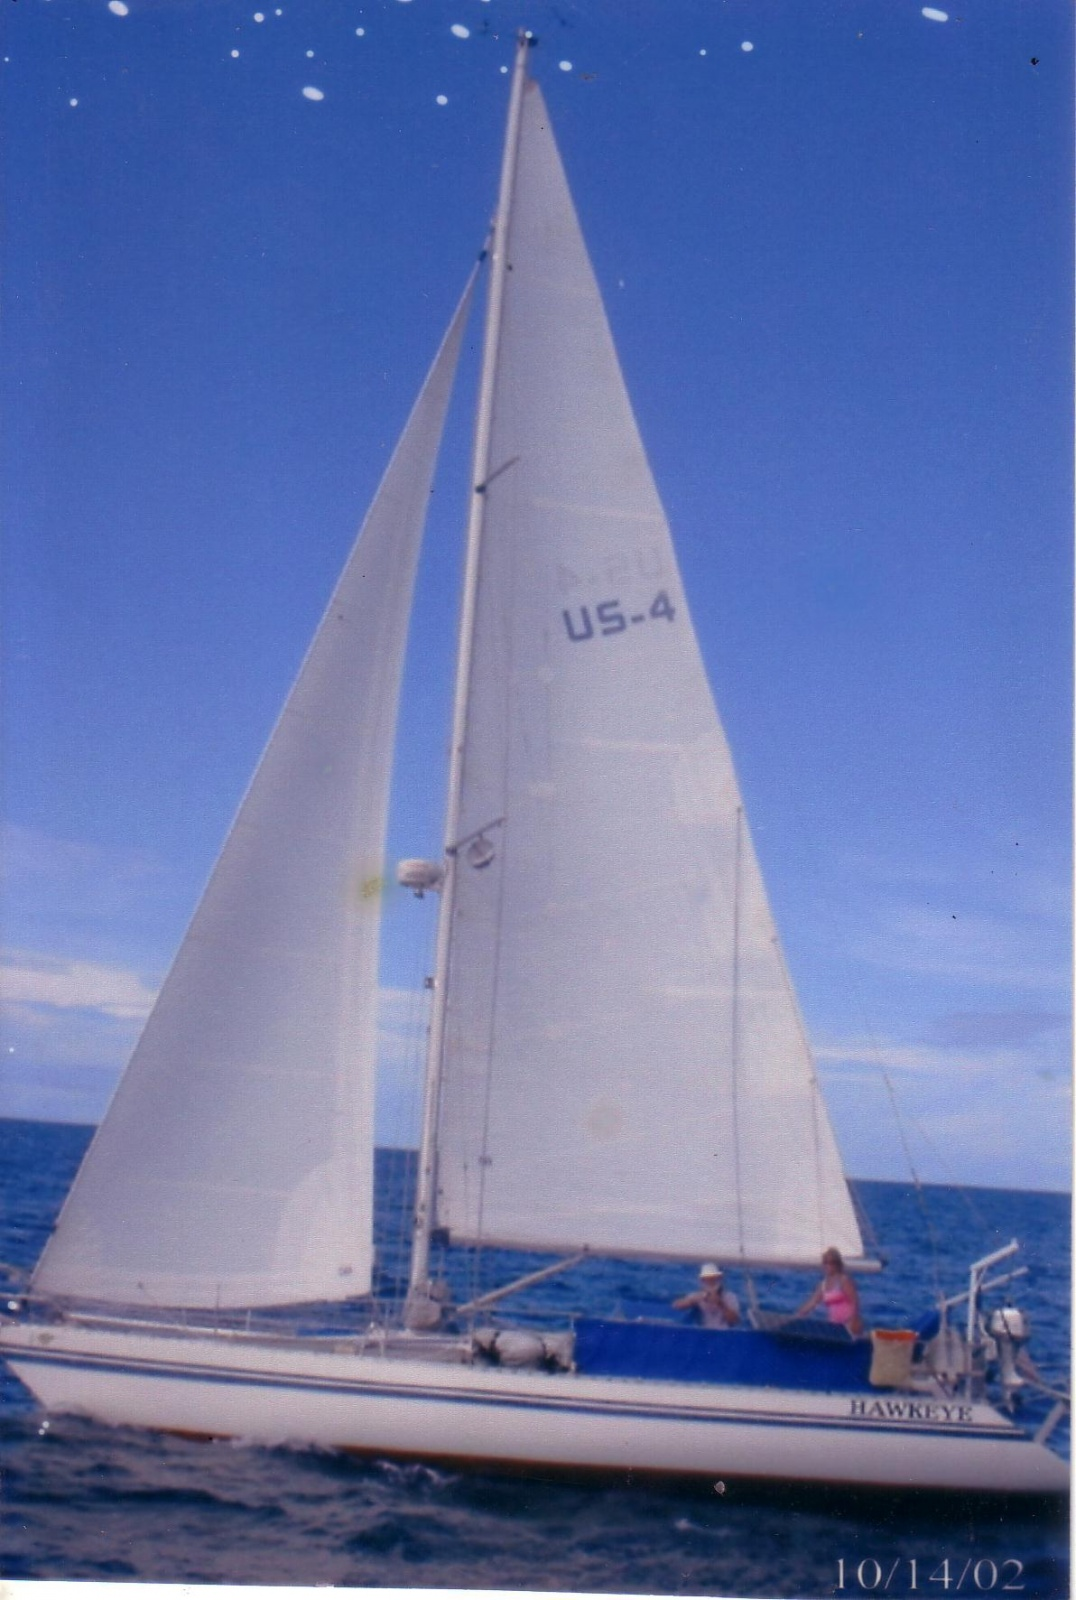 Click image for larger version  Name:Hawkeye sailing 1.jpg Views:230 Size:394.3 KB ID:163585